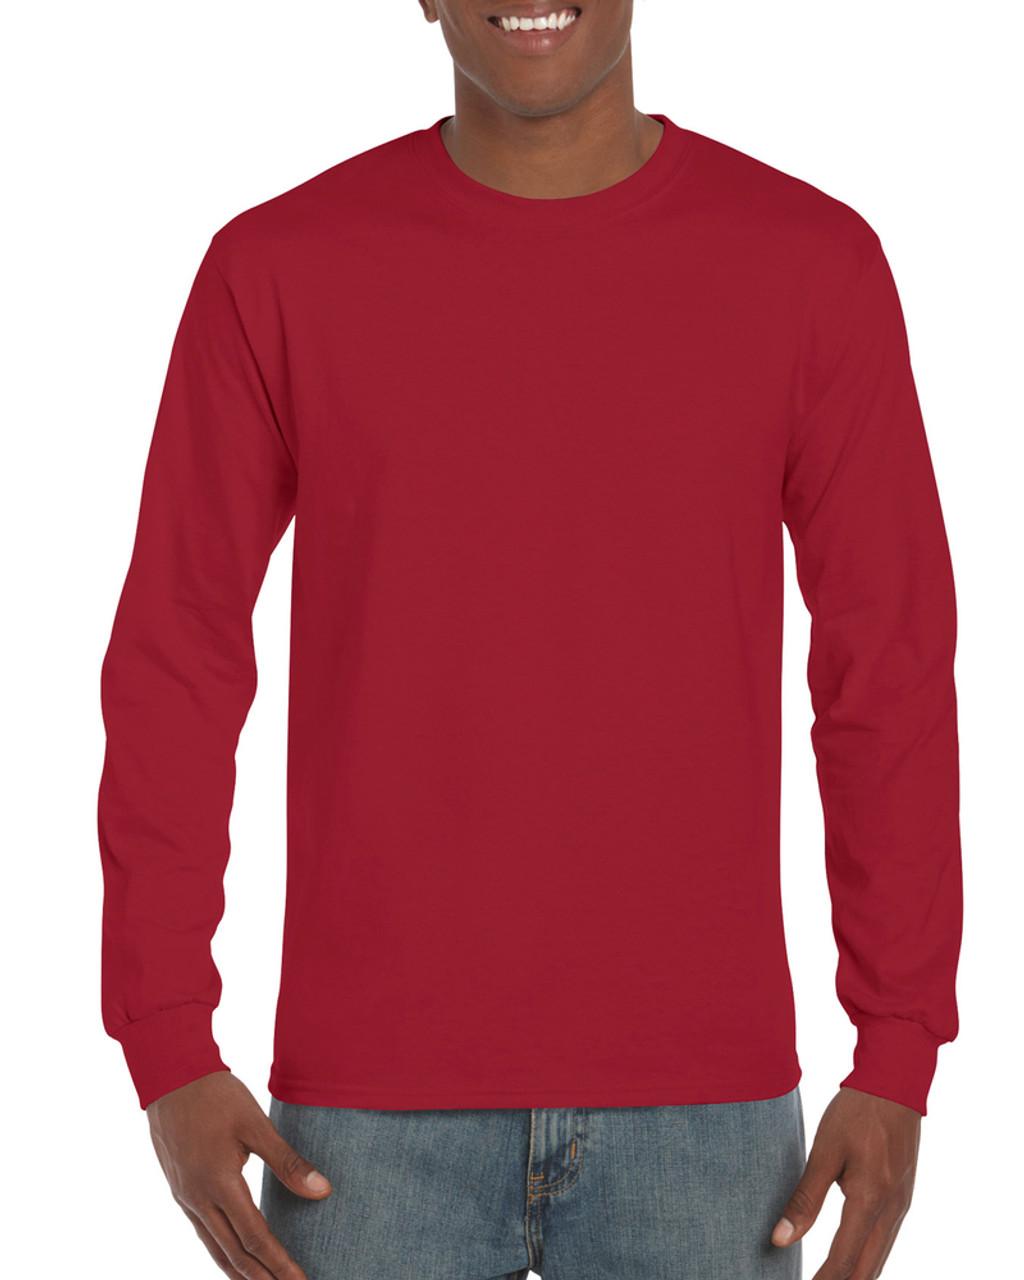 red t shirt long sleeve